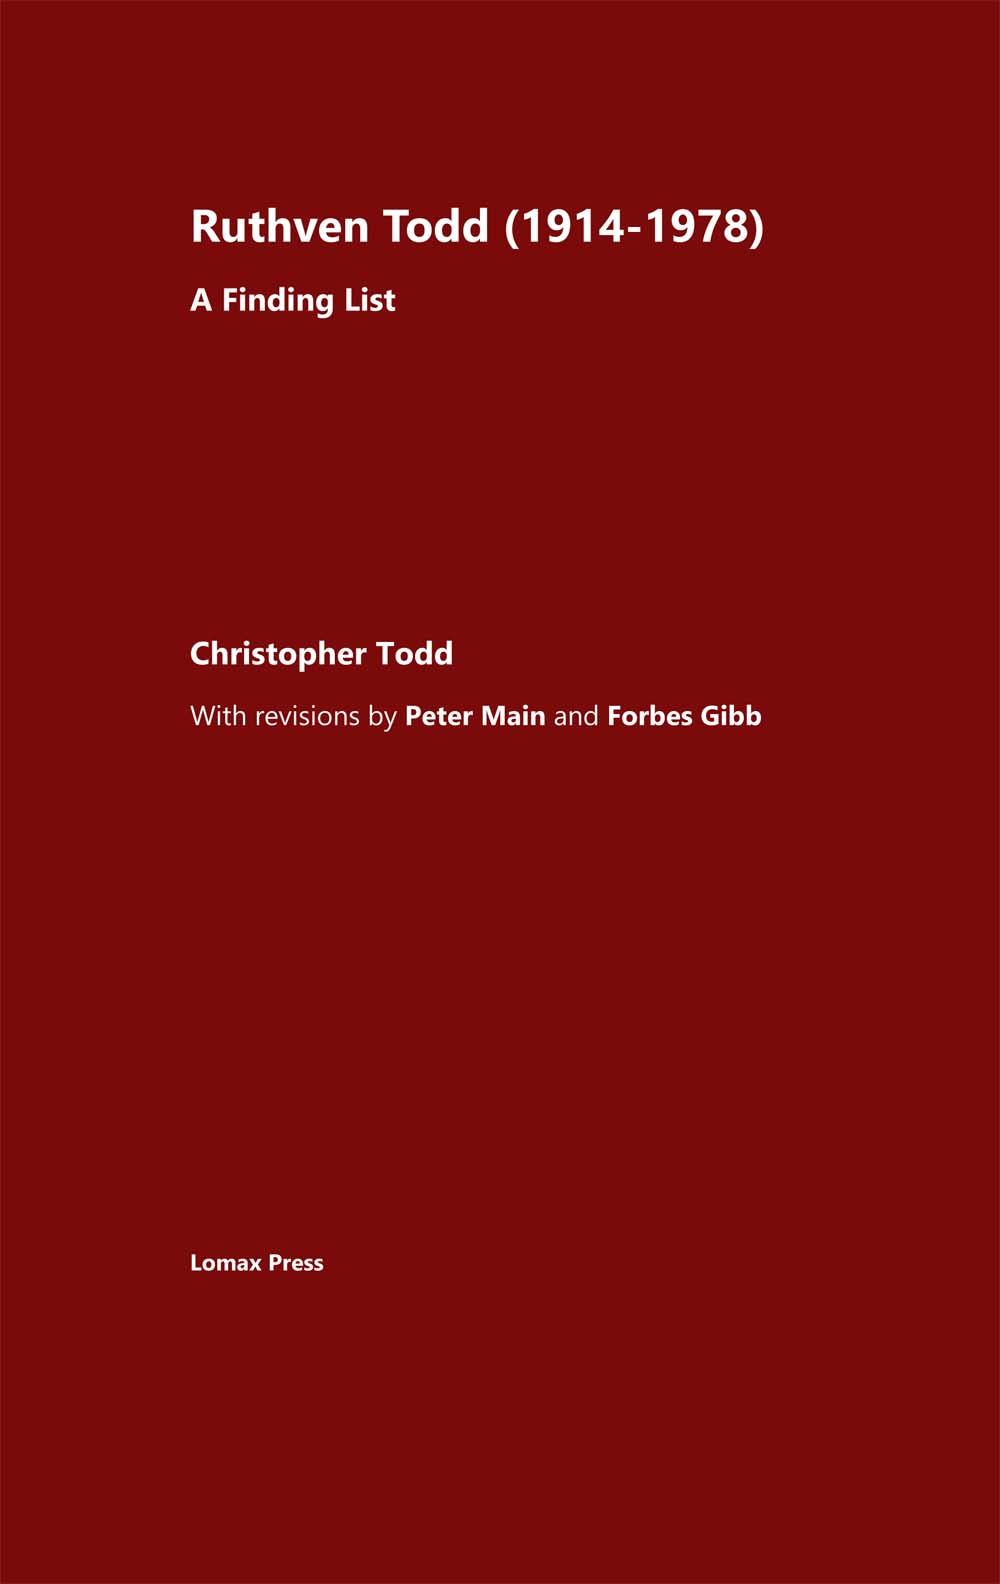 Ruthven Todd (1914-1978) : A finding list